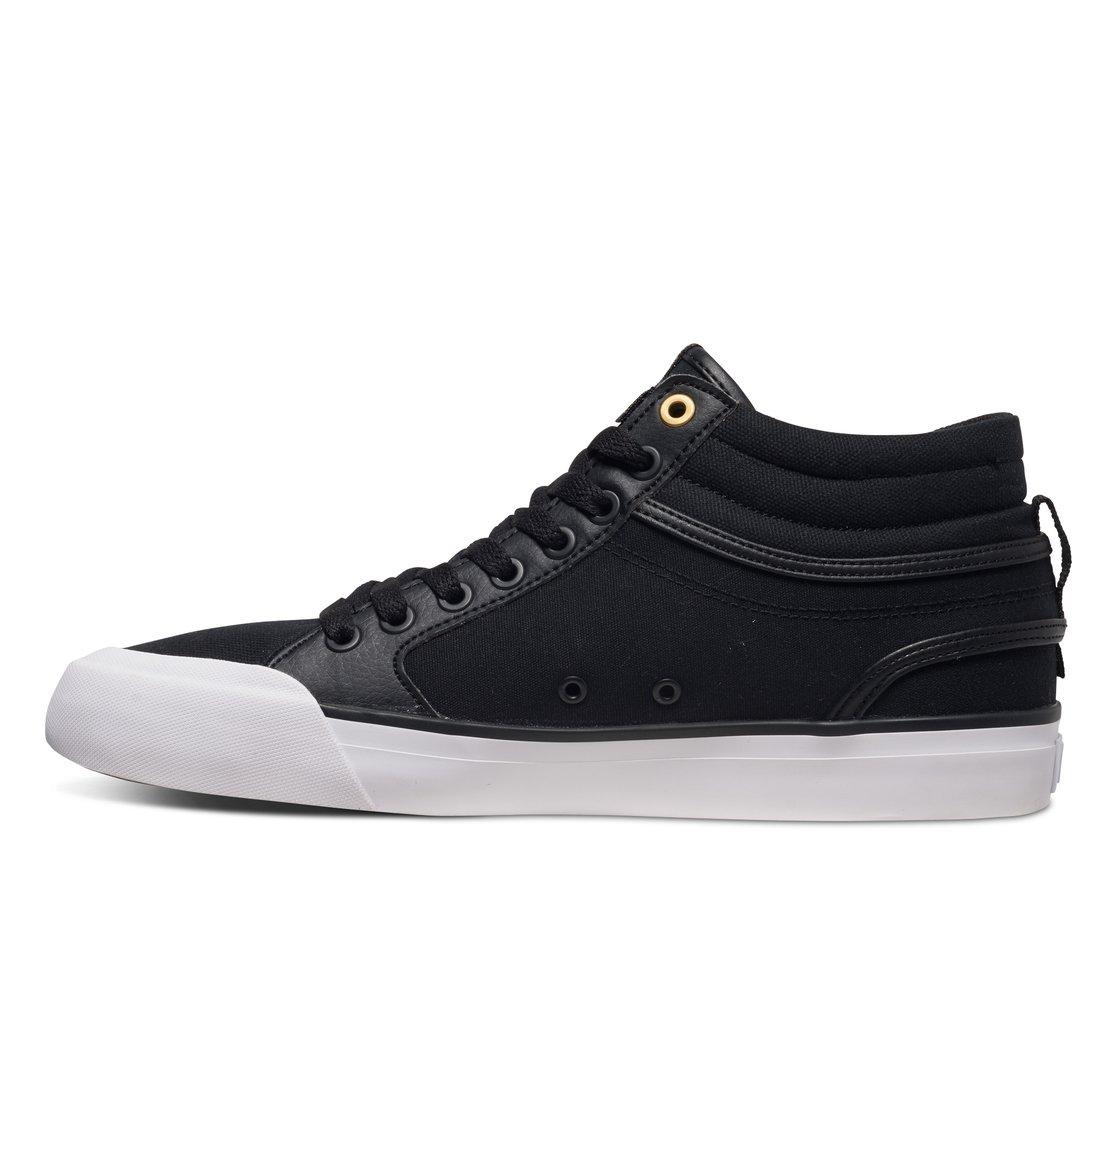 cdc737d861 2 Evan Smith Hi High Top Shoes ADYS300246 DC Shoes